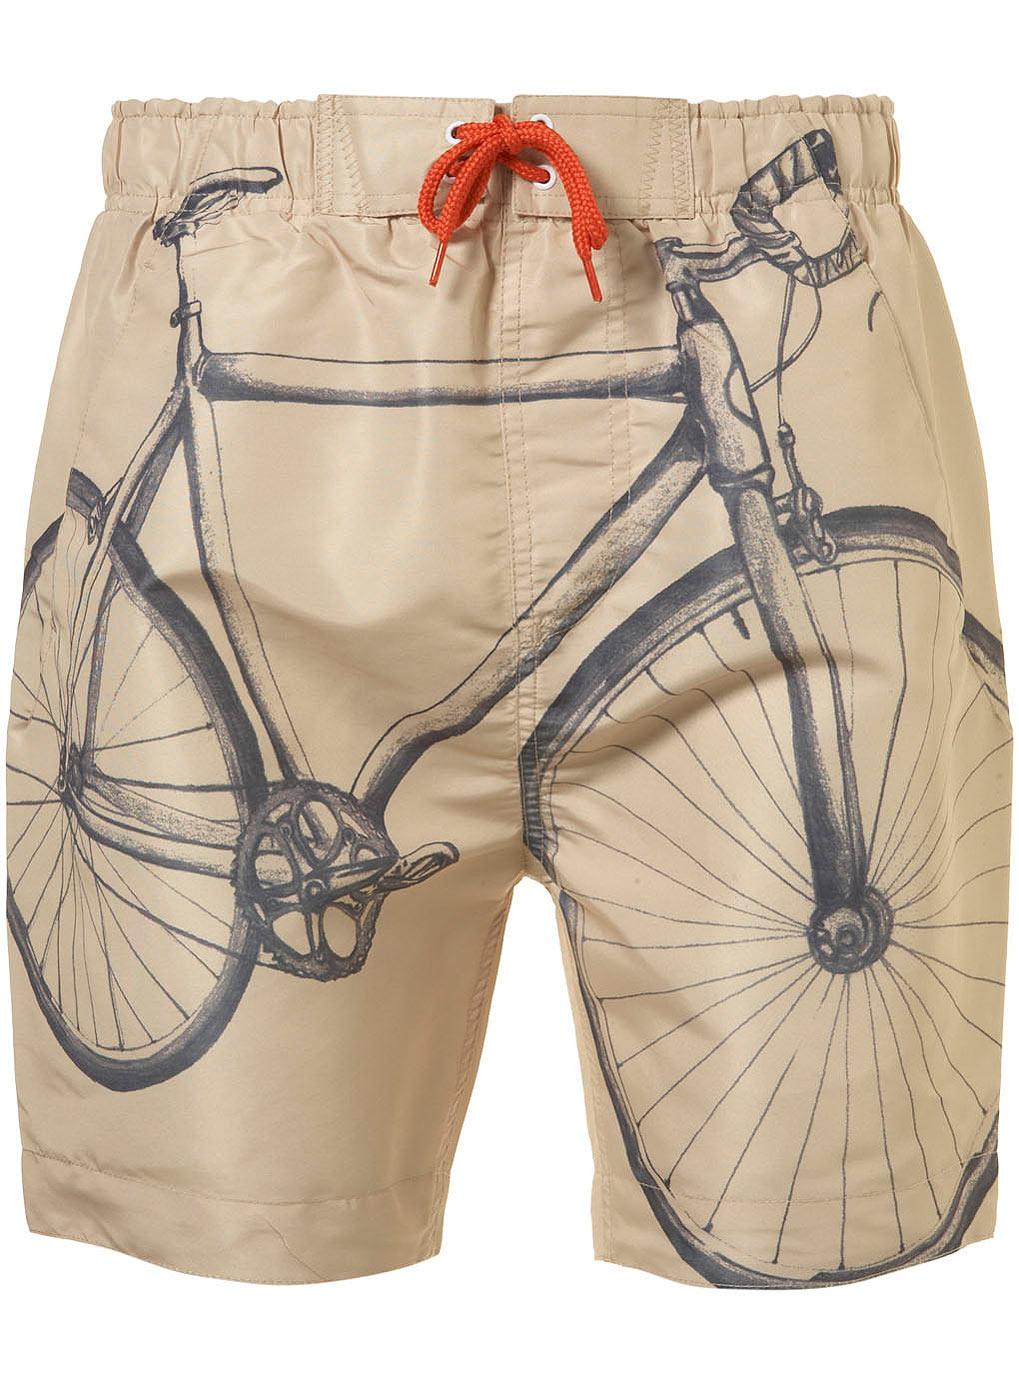 288b452a35 Buckets & Spades - Men's Fashion, Design and Lifestyle Blog: Topman ...